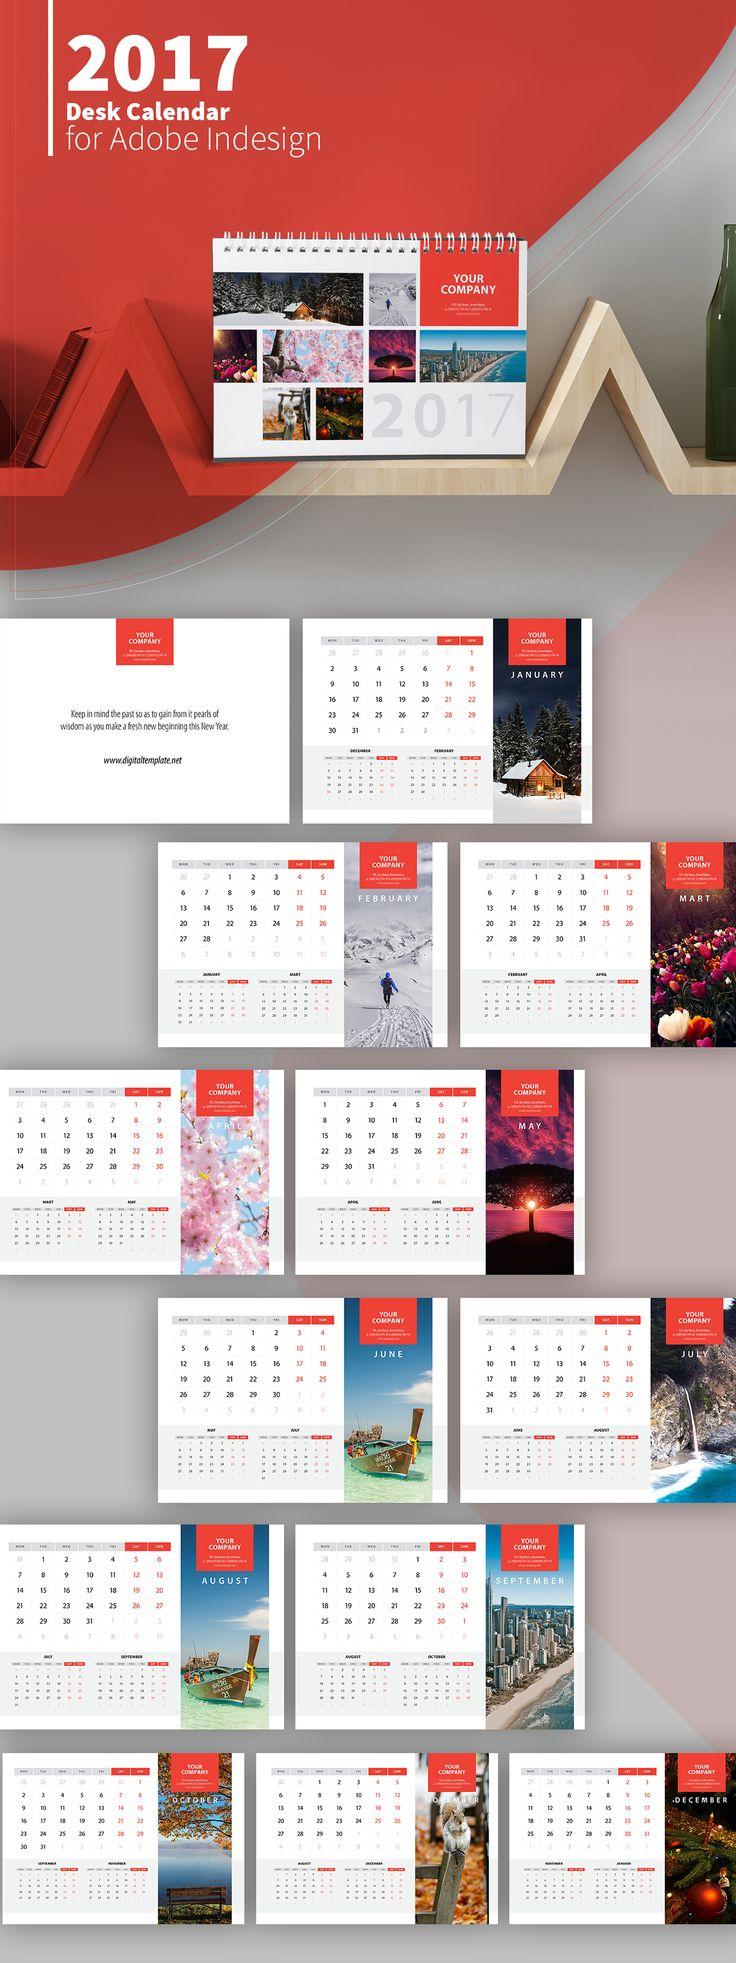 Calendar Typography Templates : The best calendar ideas on pinterest